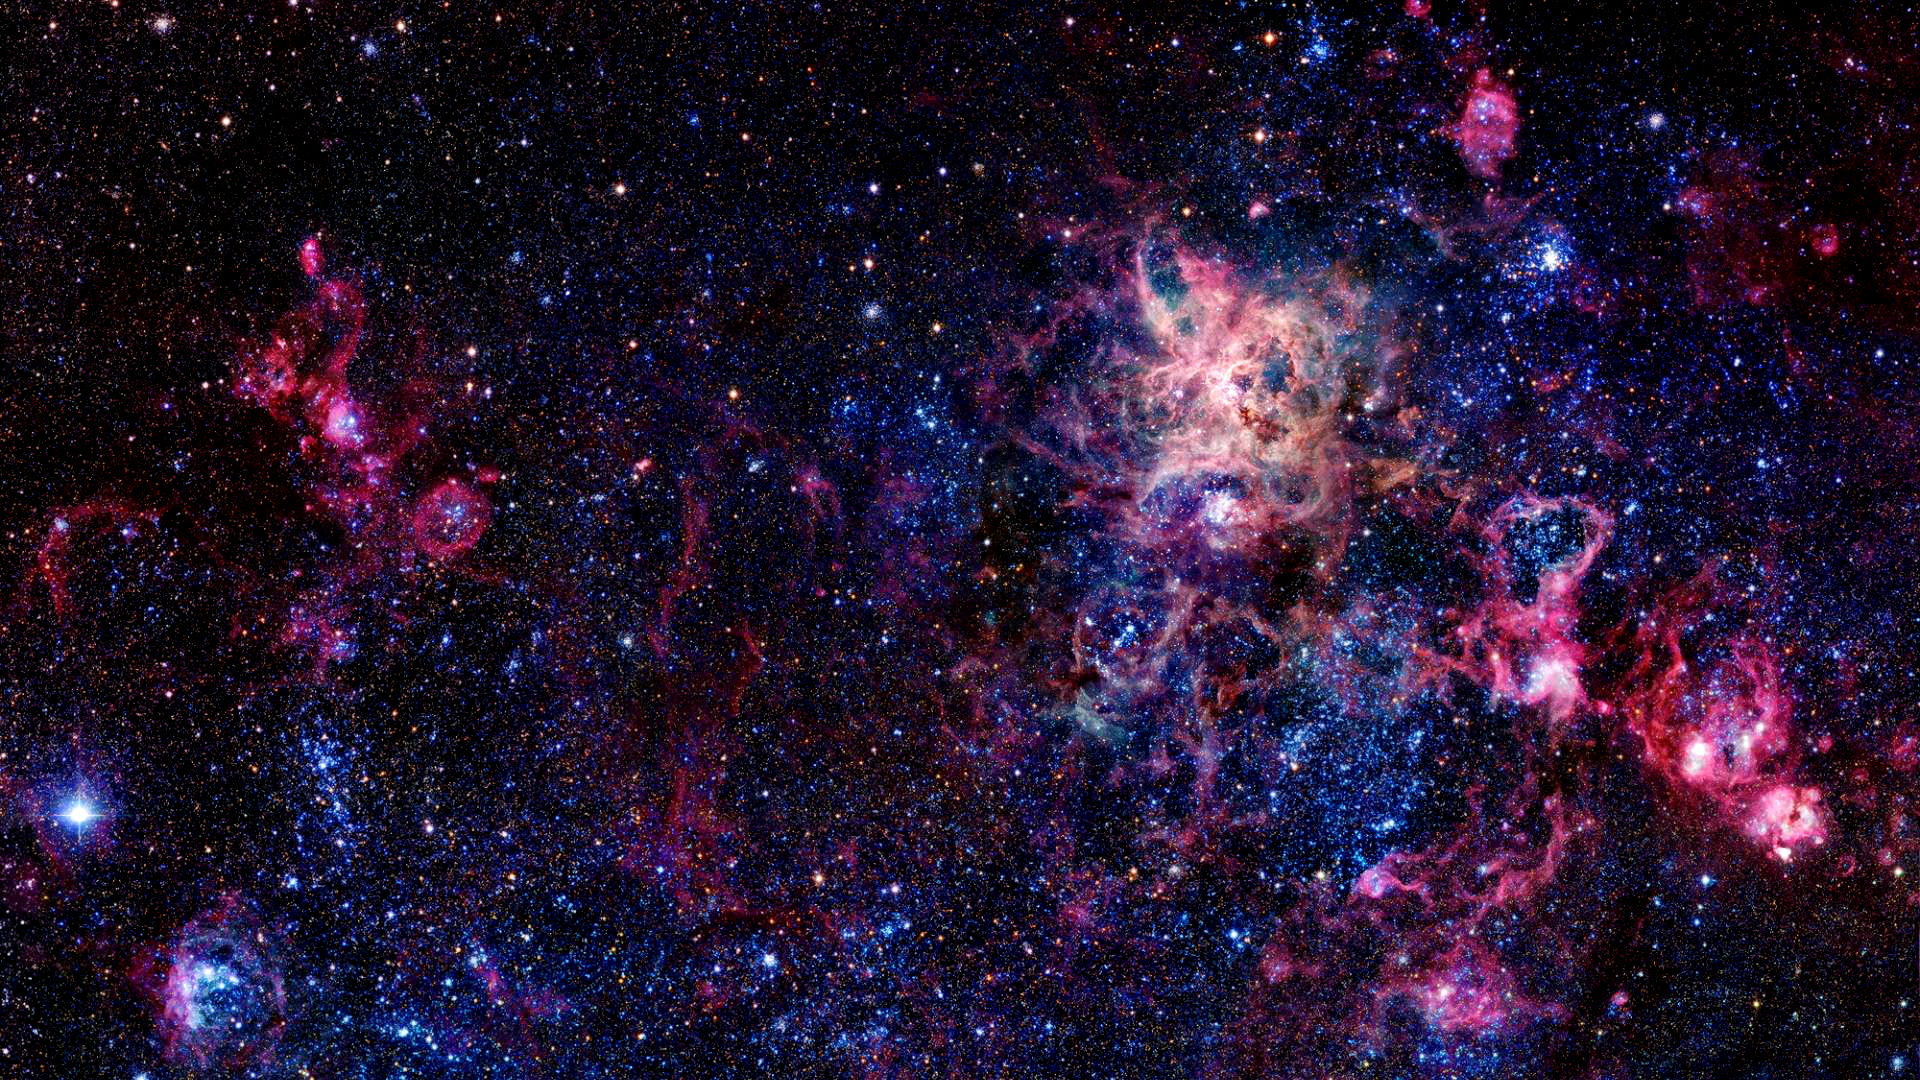 Nebula Desktop Wallpapers 1920x1080